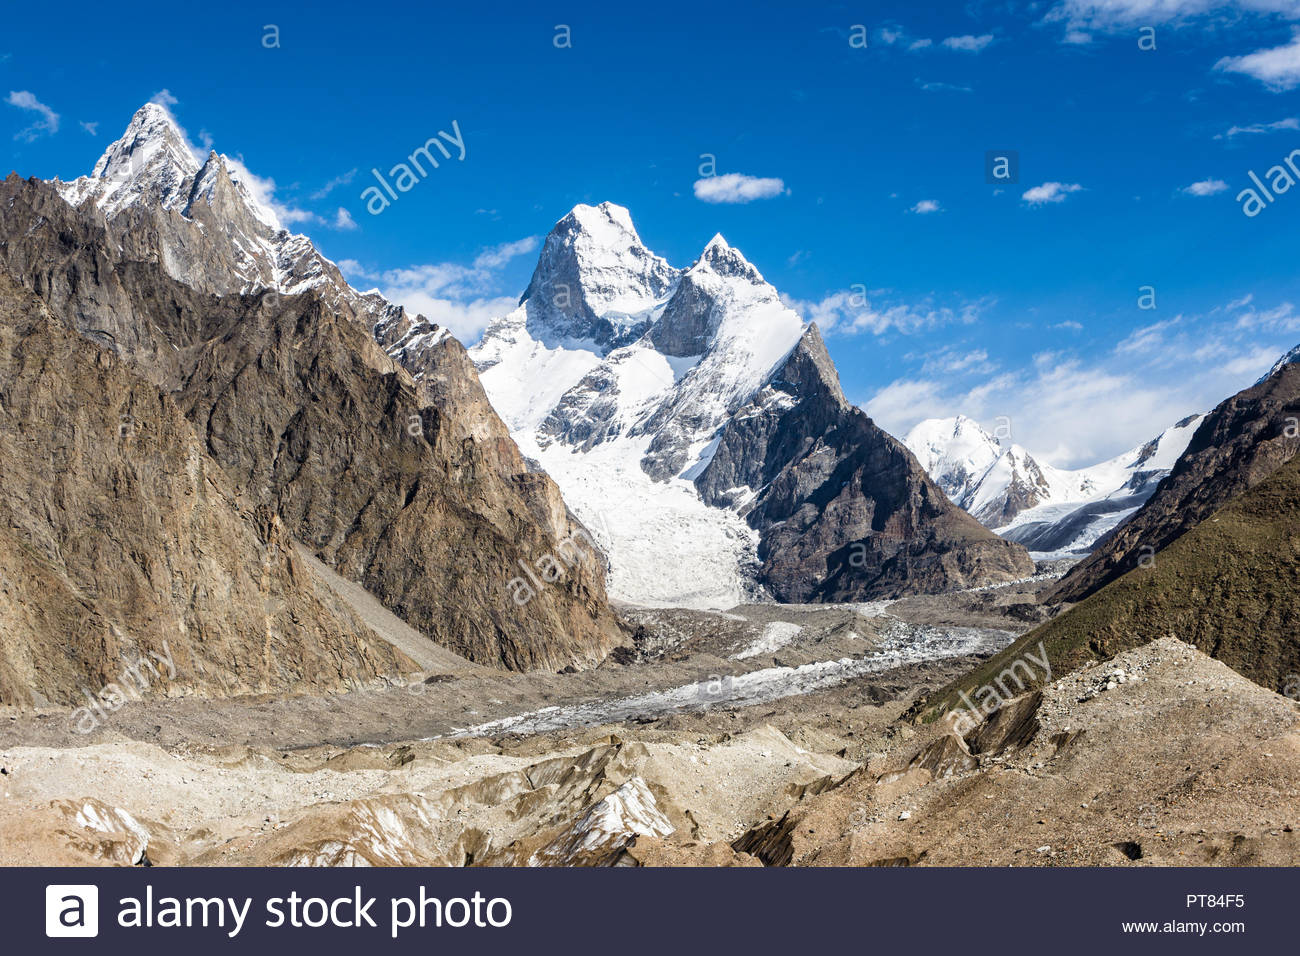 Muztagh Tower, Biange I & II peaks and Biange Glacier, Muztagh Baltoro region, Karakoram mountain range, Gilgit-Balistan, Pakistan - Stock Image